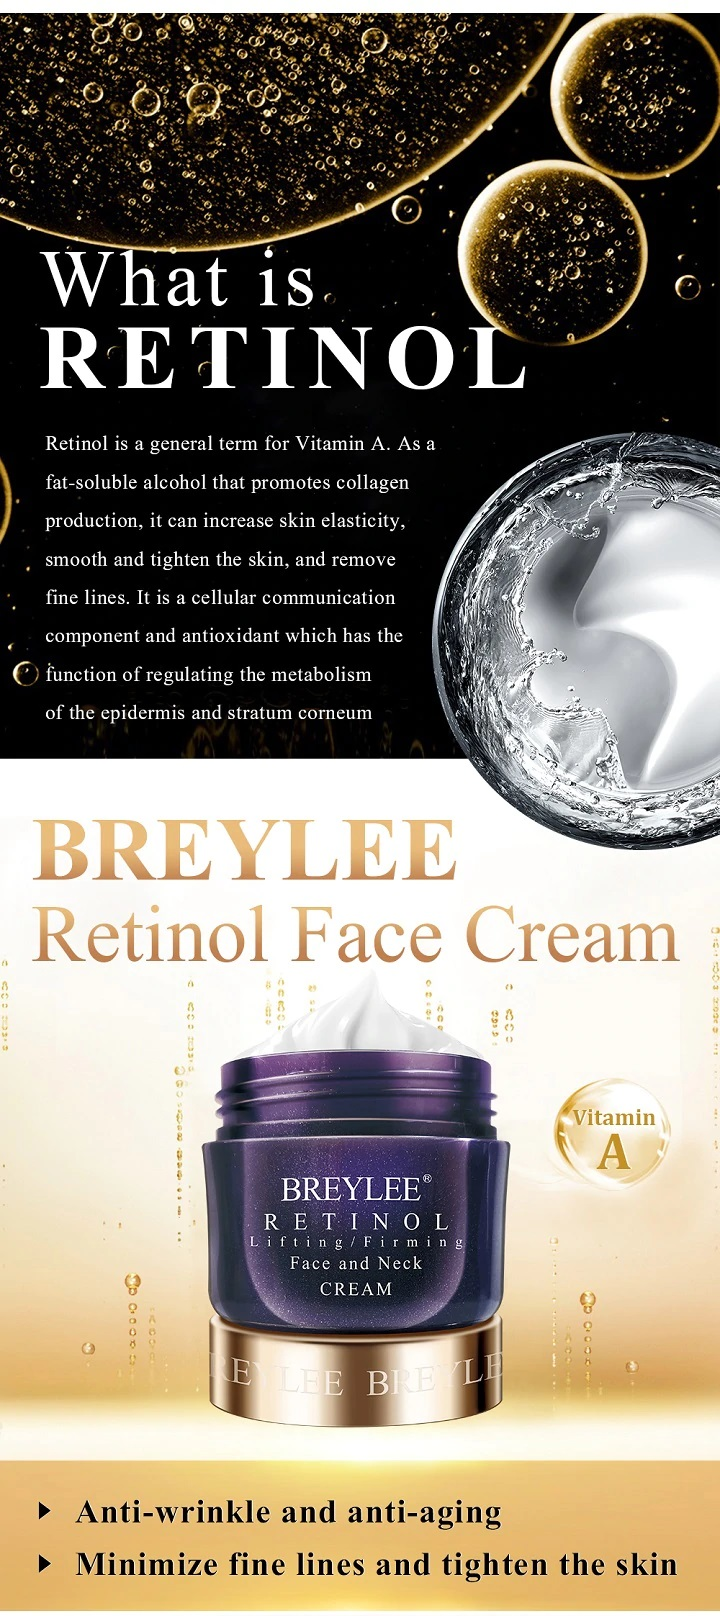 breylee-retinol-210.jpg